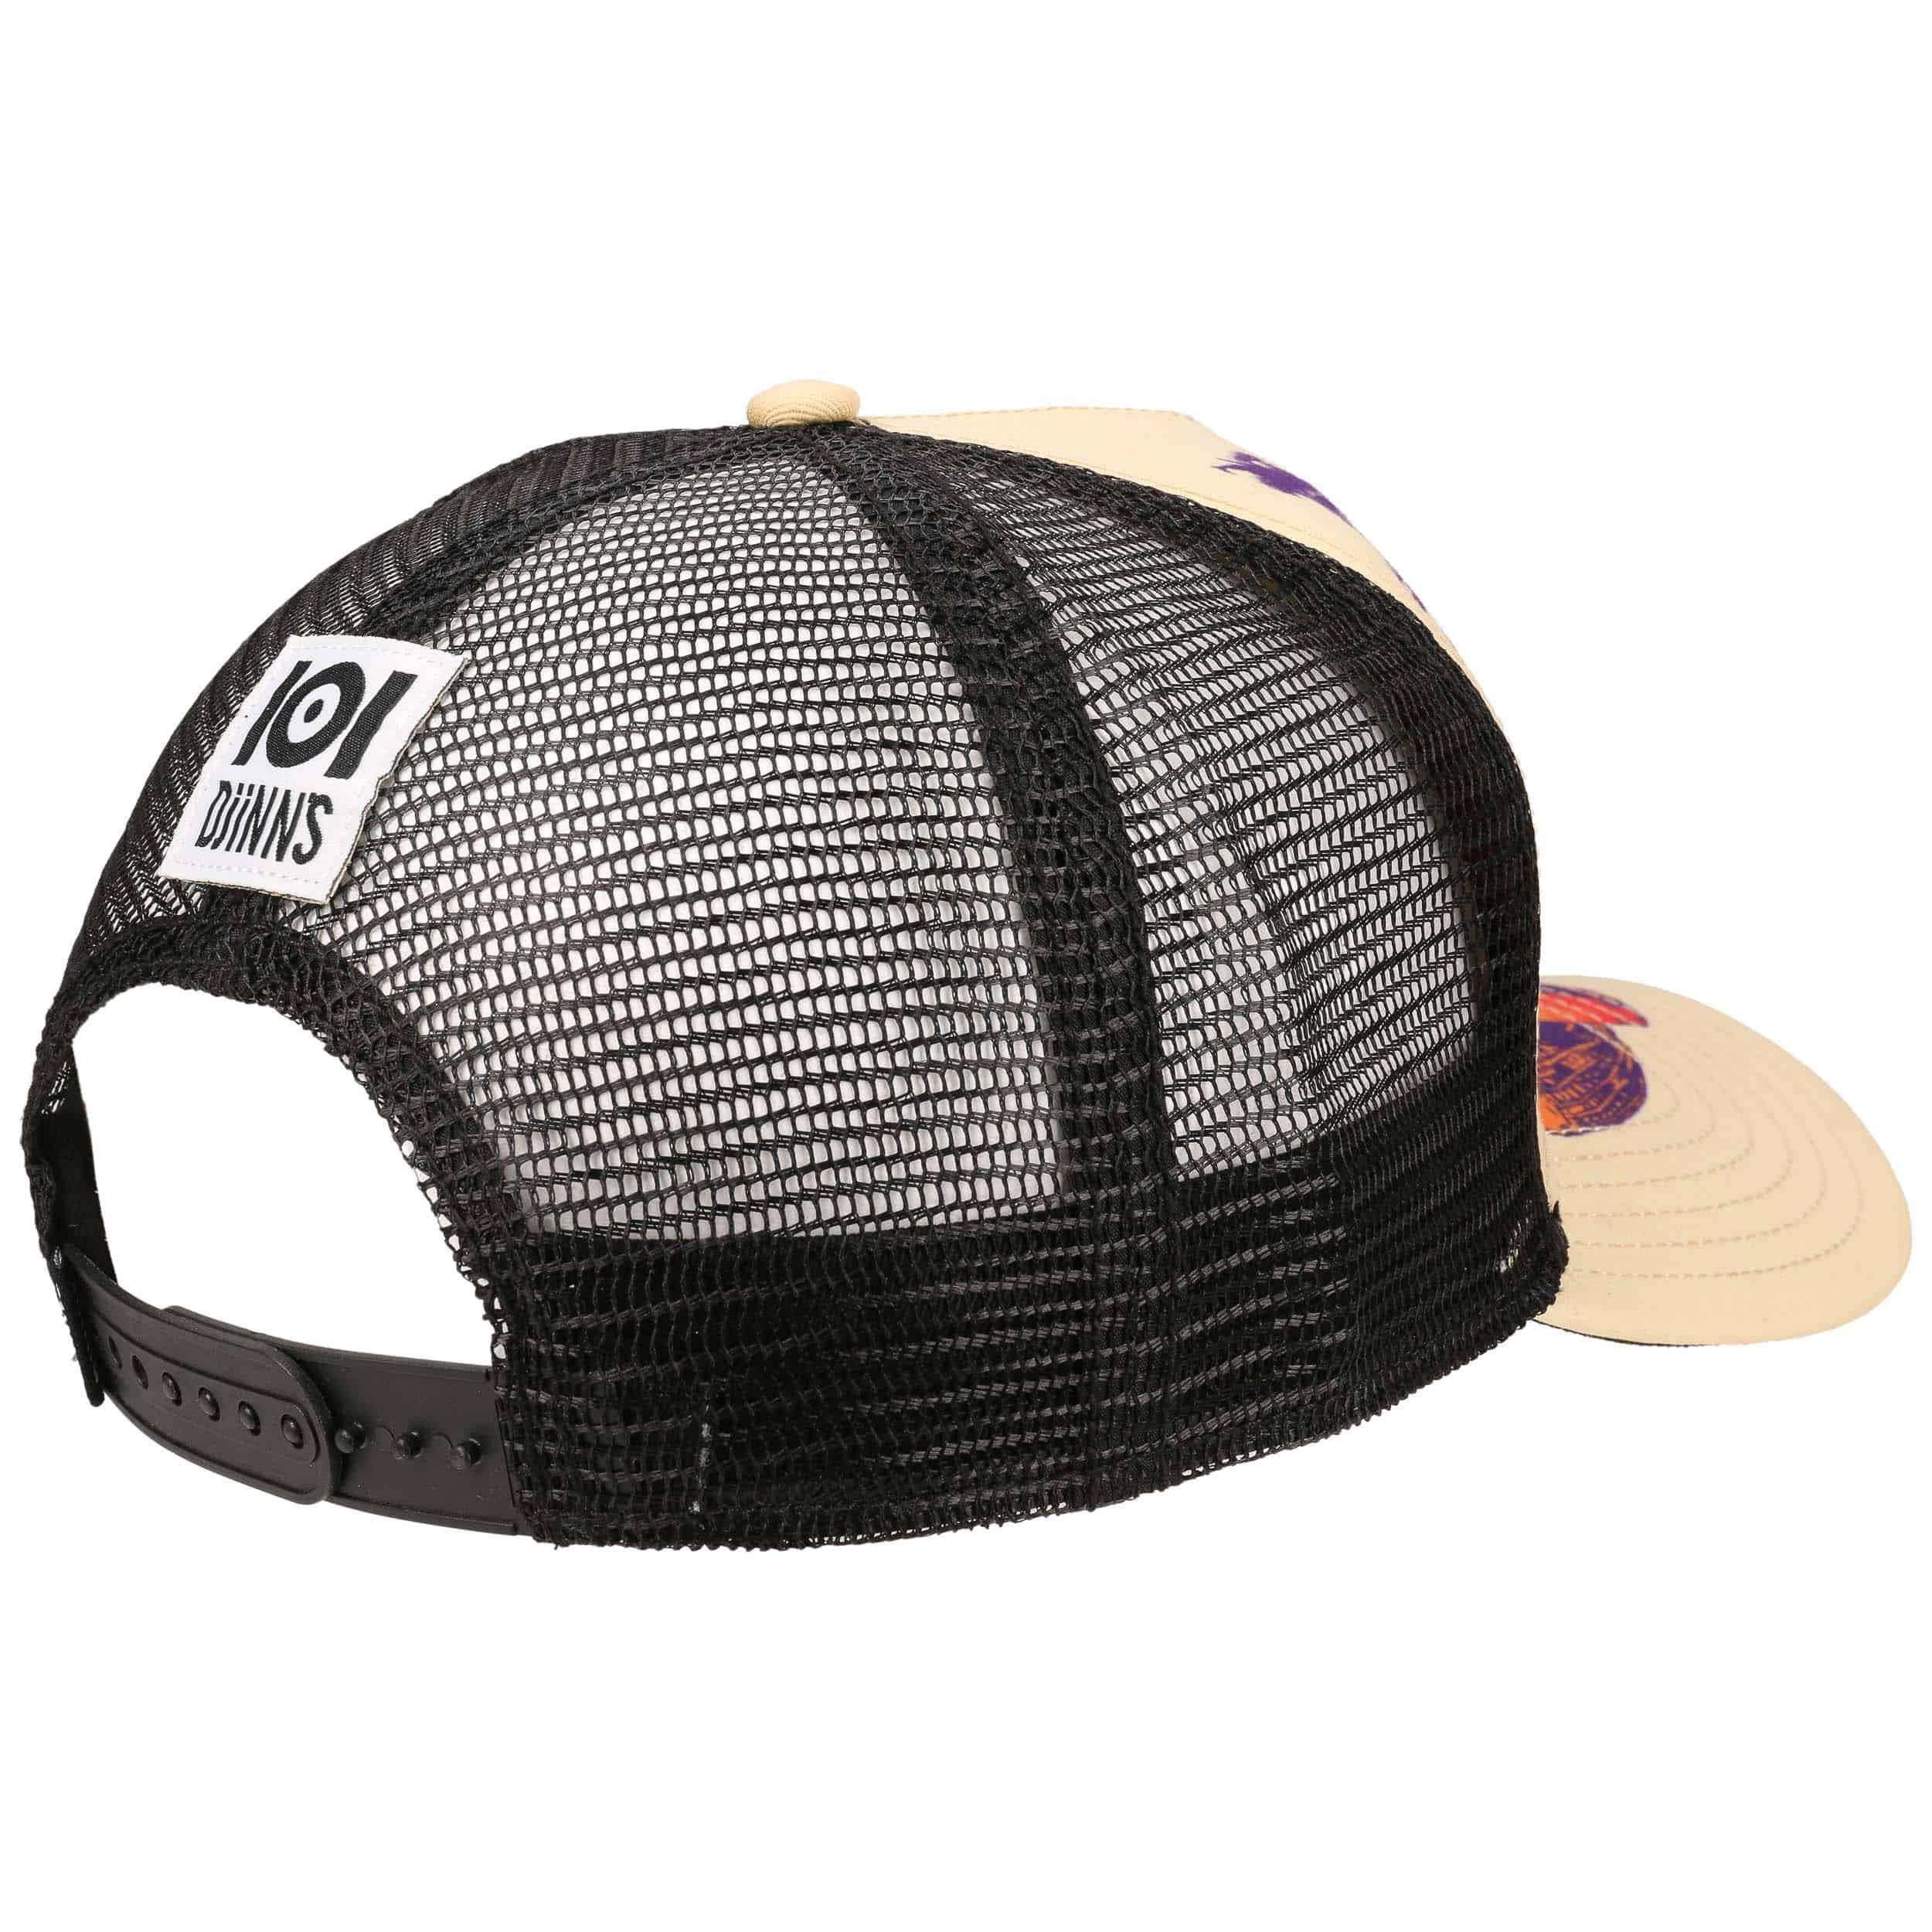 rio hft 101 trucker cap by djinns gbp 22 95 hats. Black Bedroom Furniture Sets. Home Design Ideas